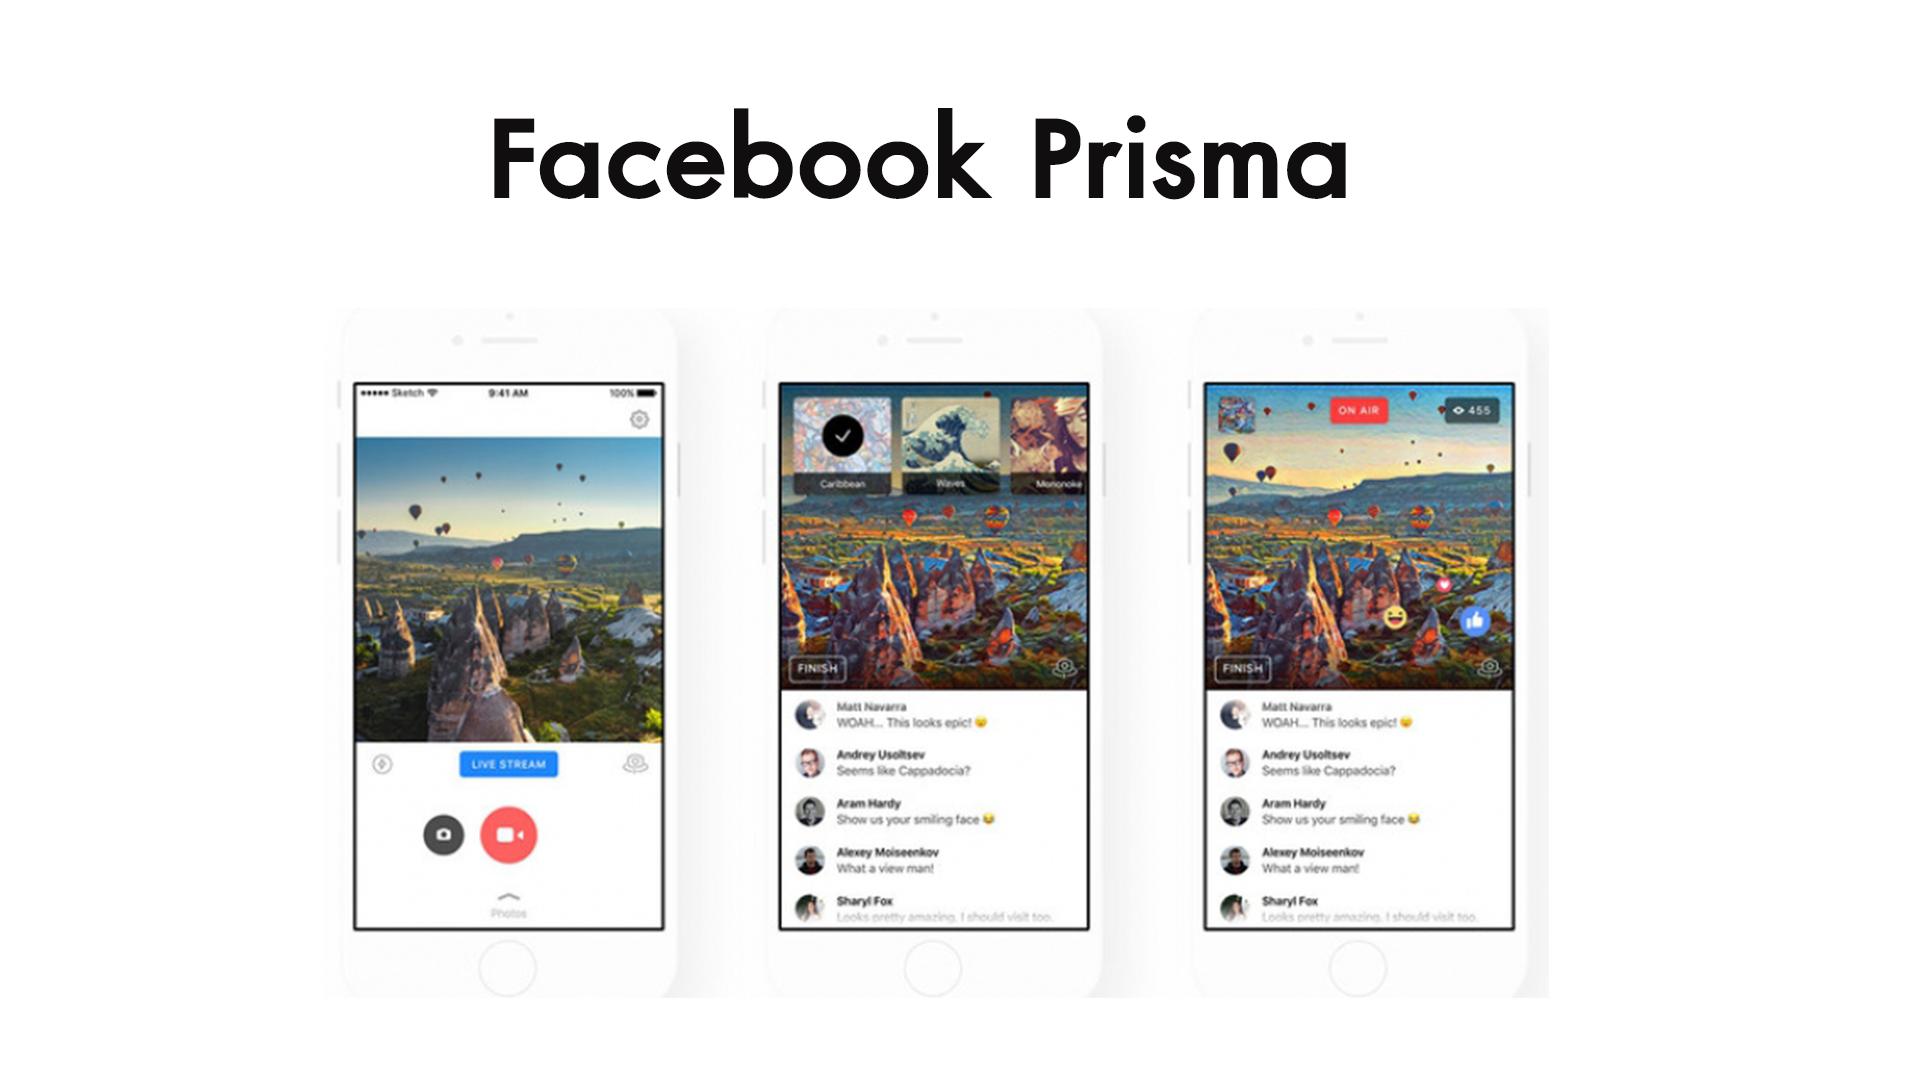 Facebook สามารถใช้งานฟิลเตอร์แอพฯ Prisma สำหรับ Live สดได้แล้วบนสมาร์ทโฟนระบบ iOS